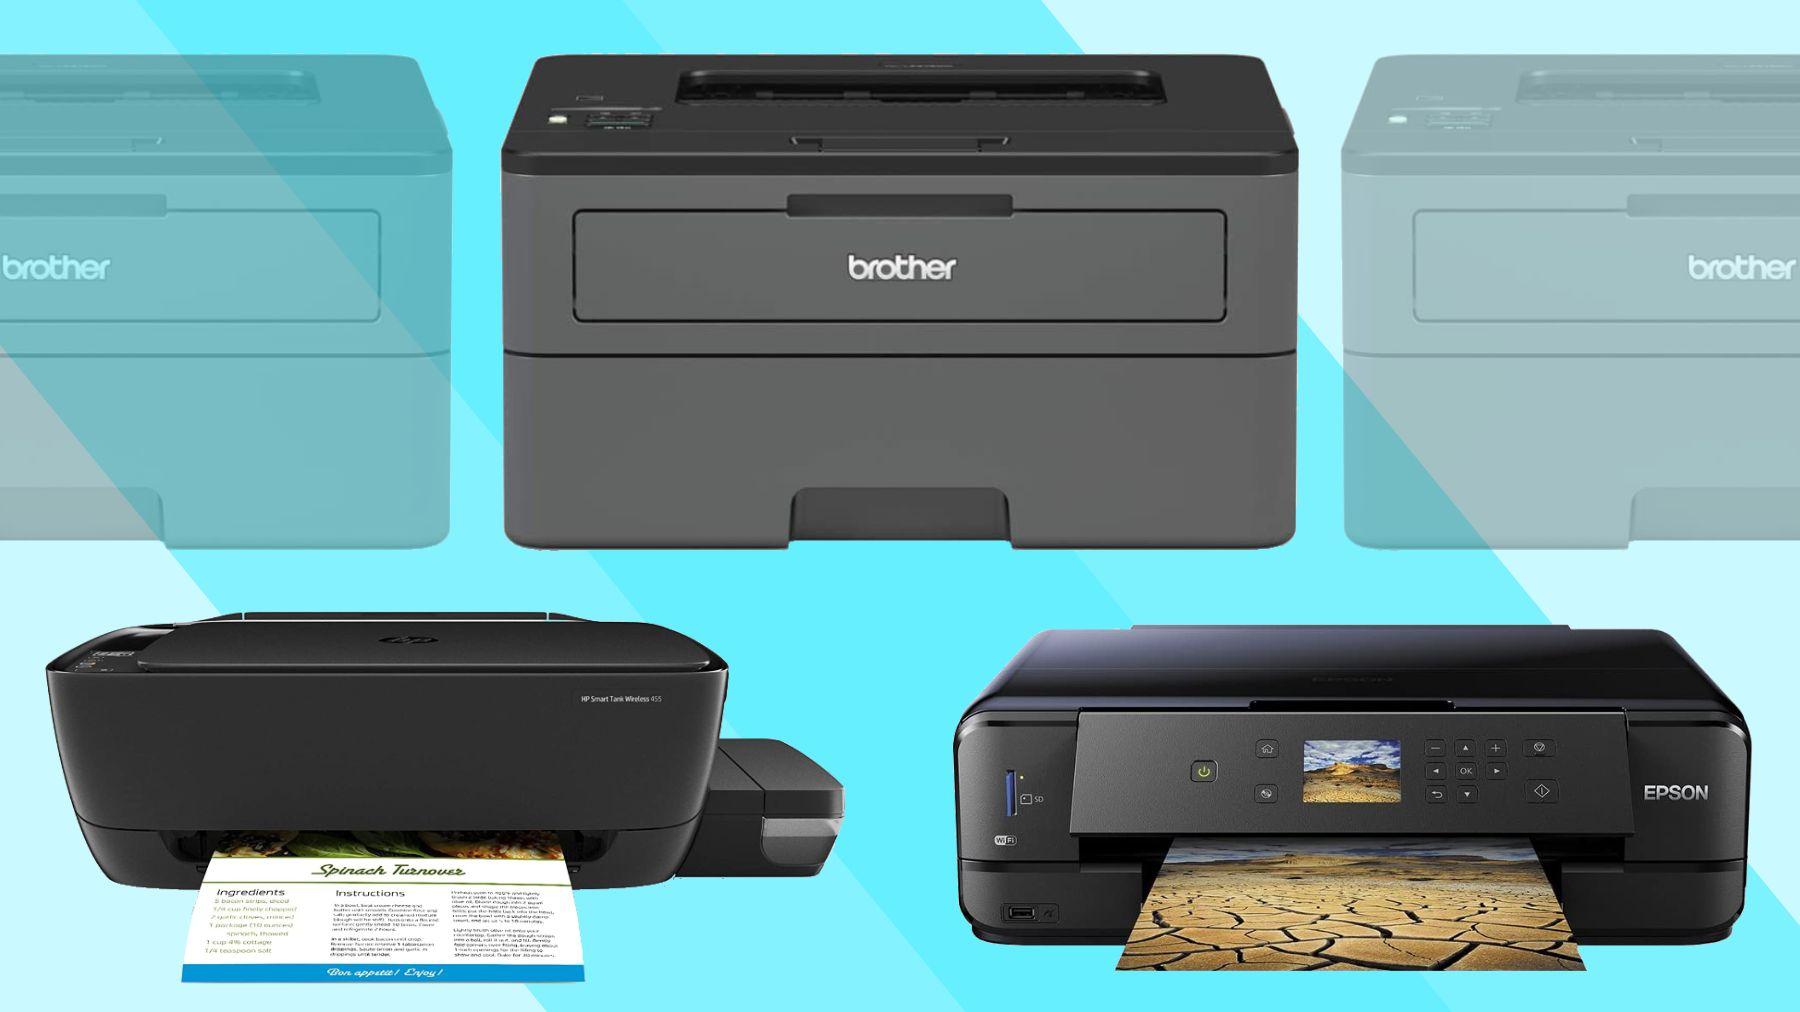 Different brand Printer demo image